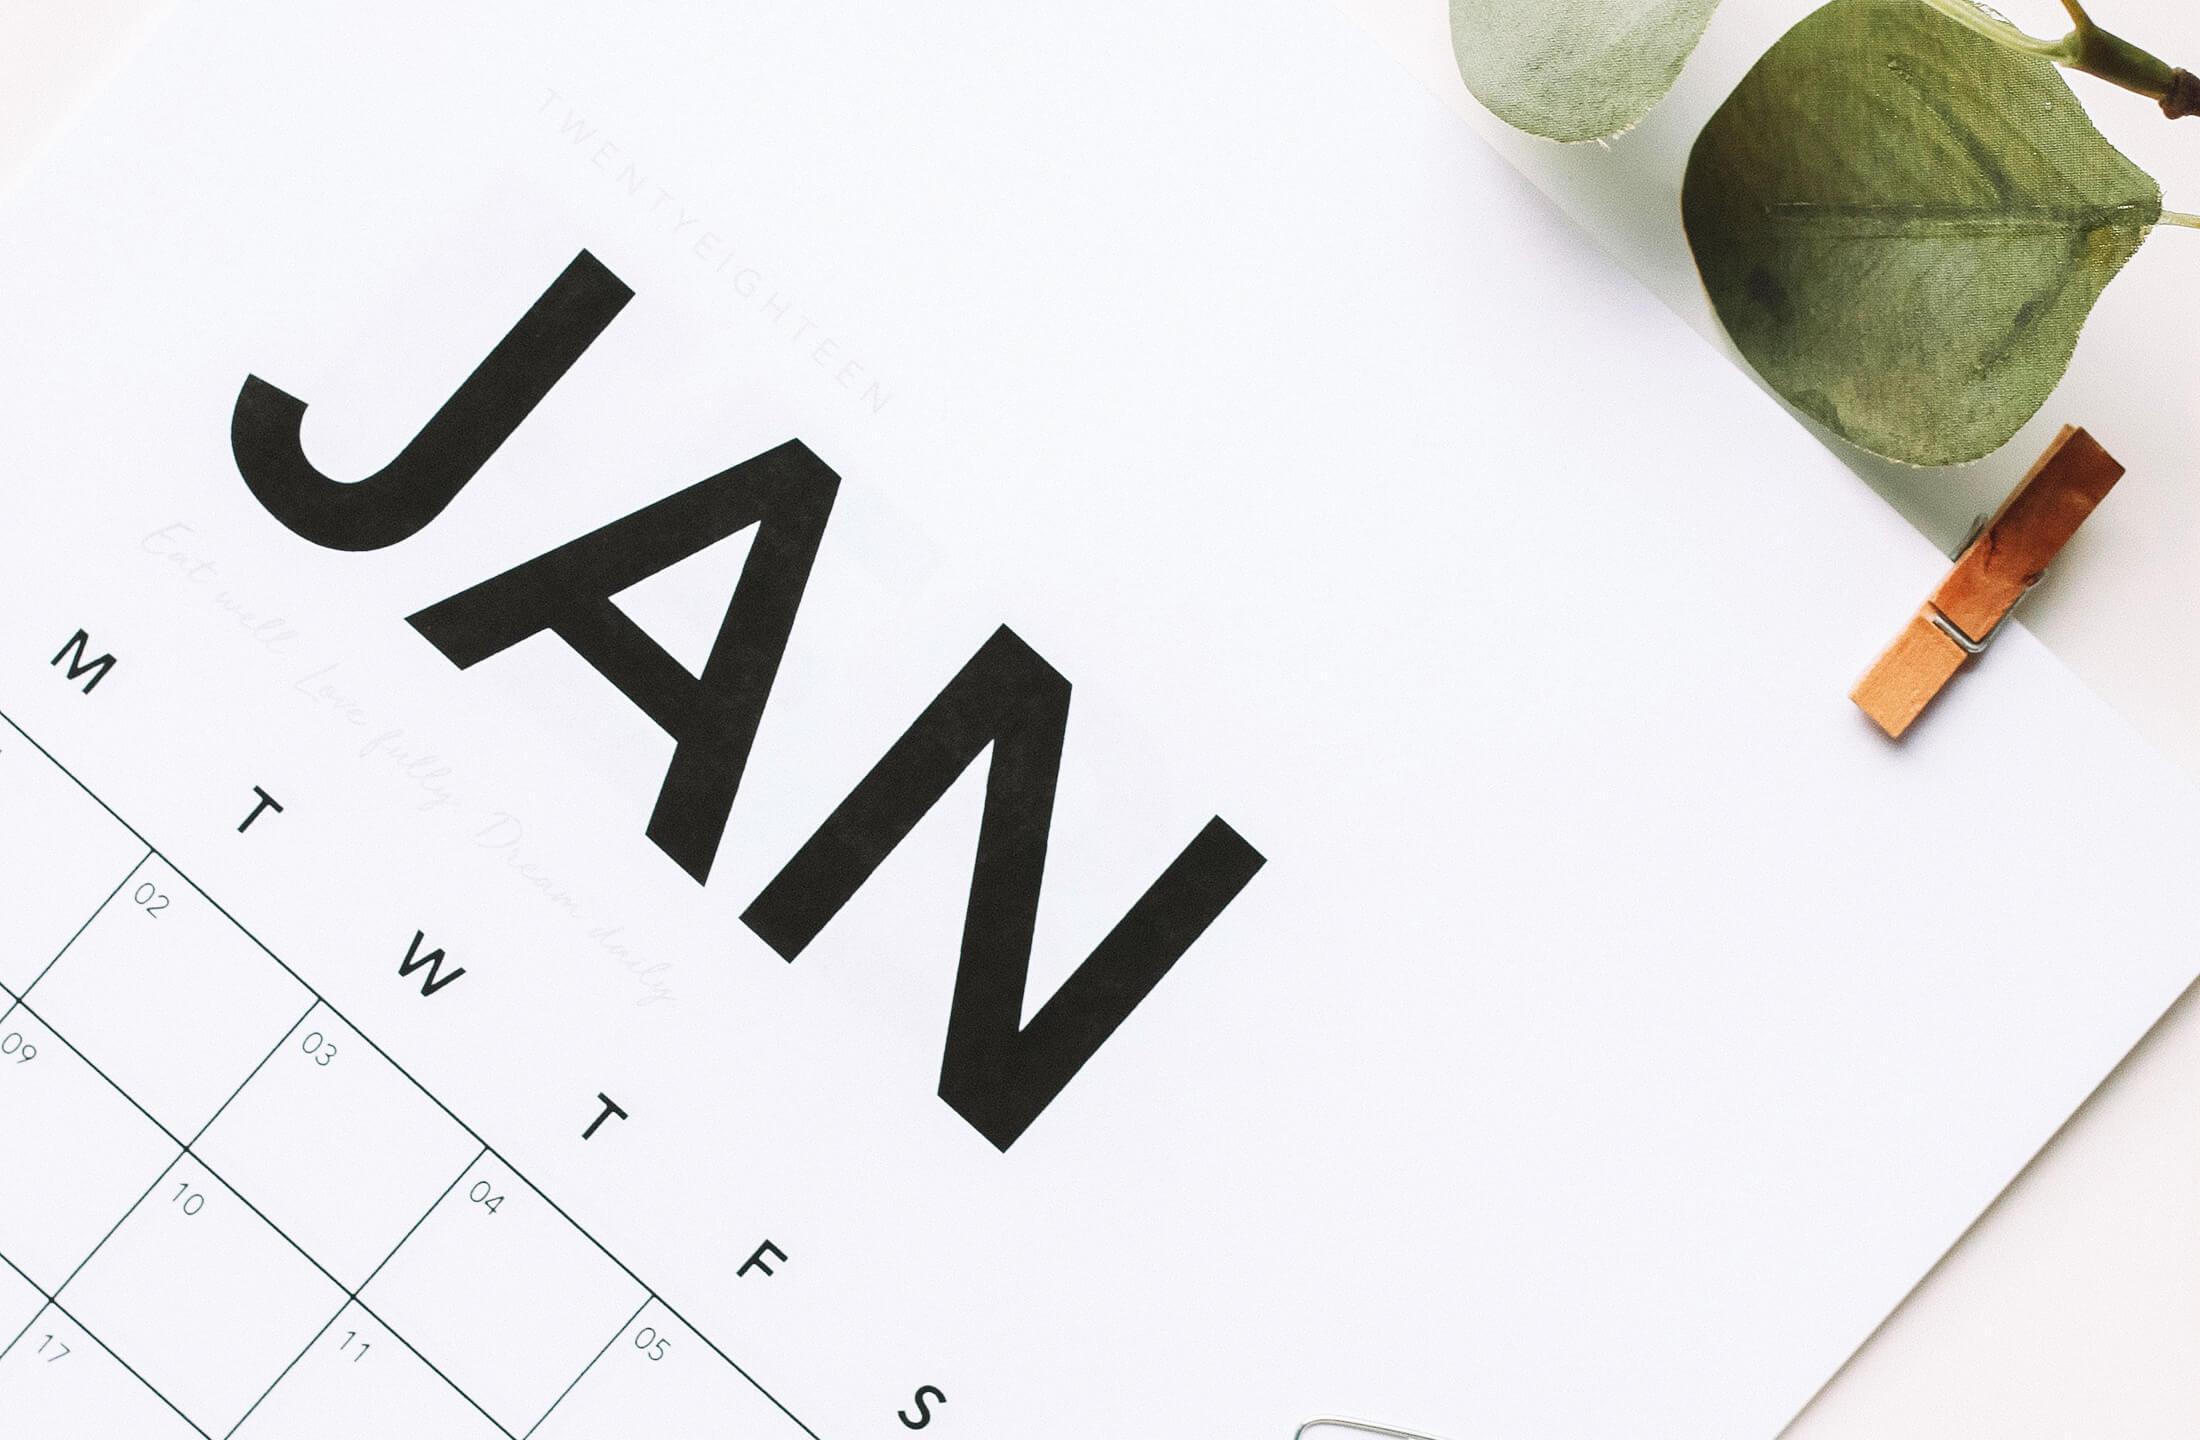 Jan 31st Startup Tax Deadlines